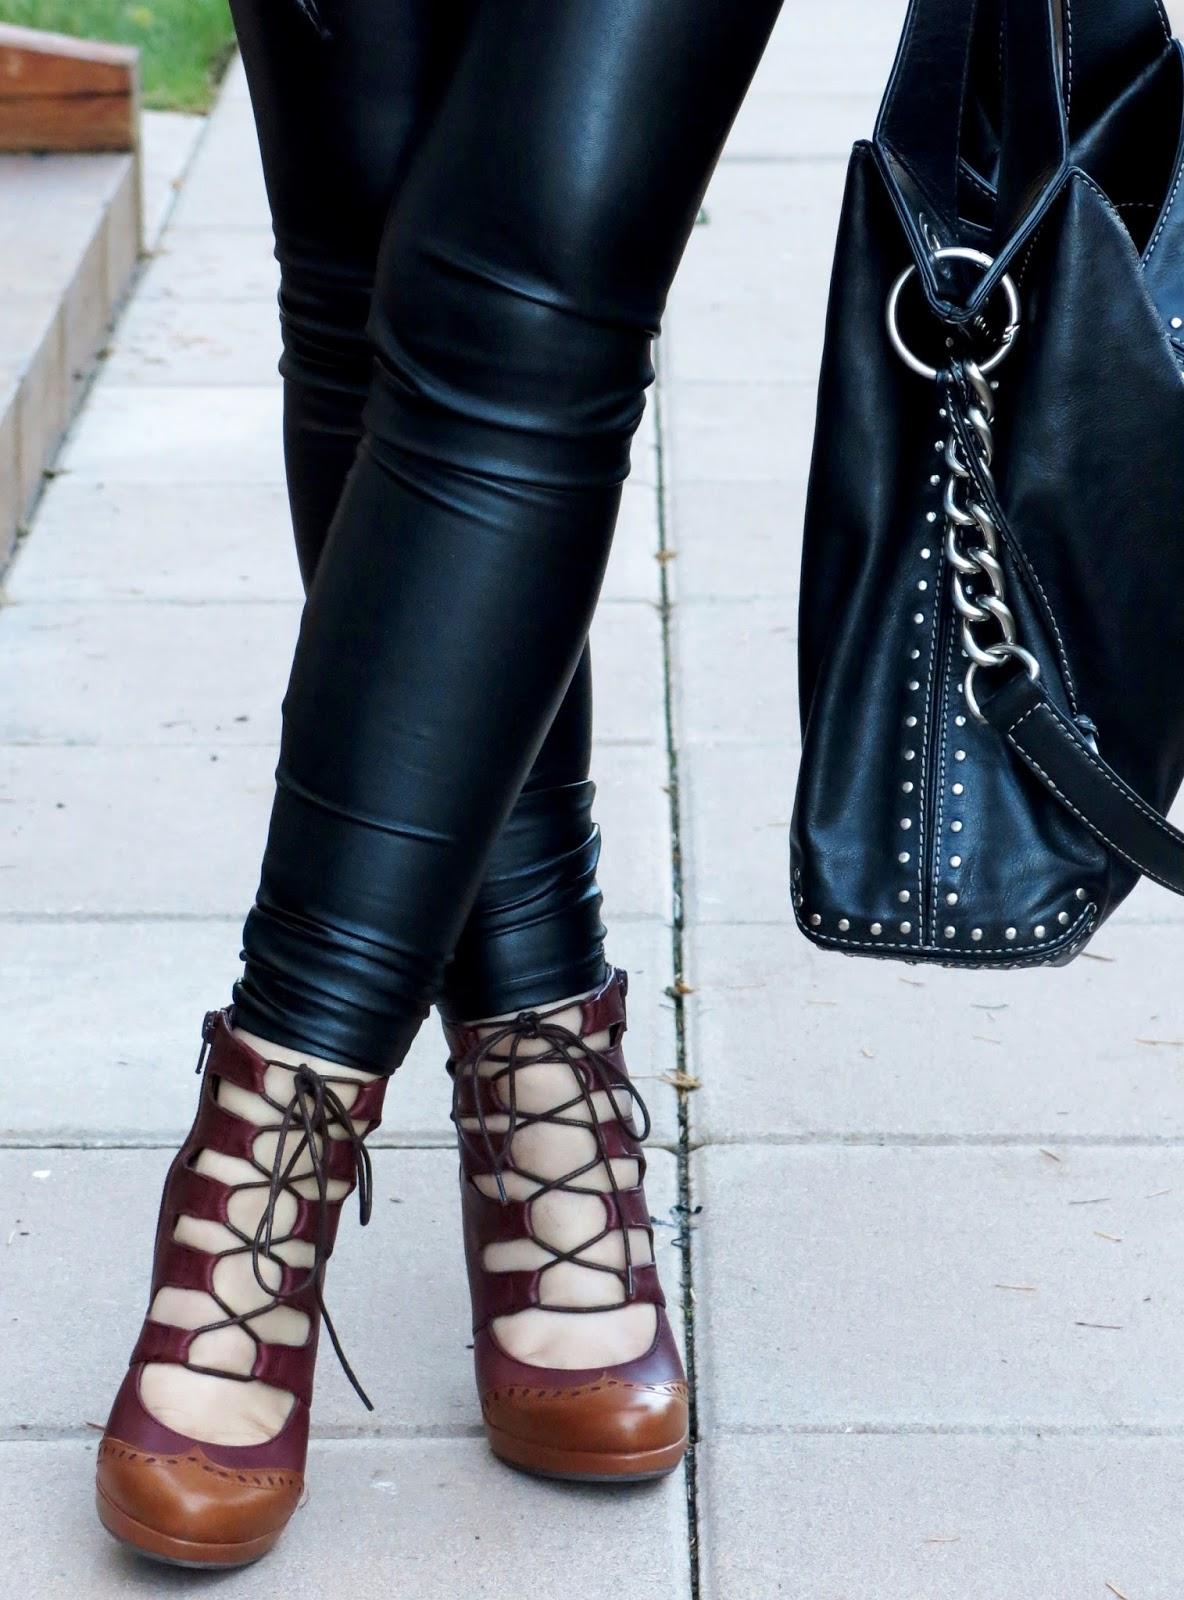 vegan leather leggings, lace-up heels, and Michael Kors bag